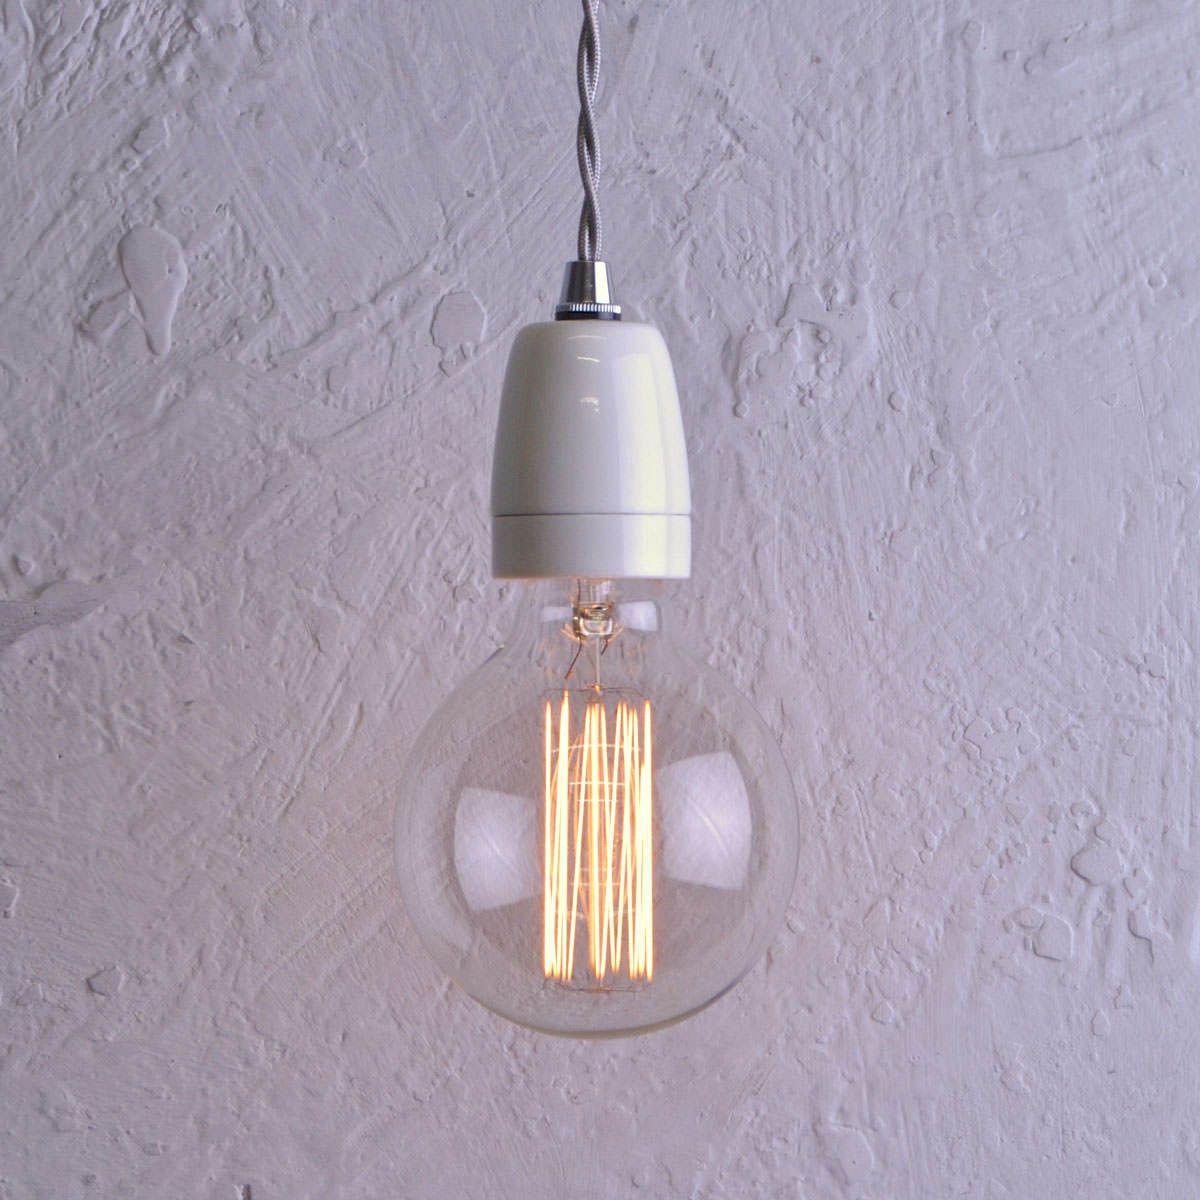 Ceramic Vintage Pendant Light White Artifact Lighting